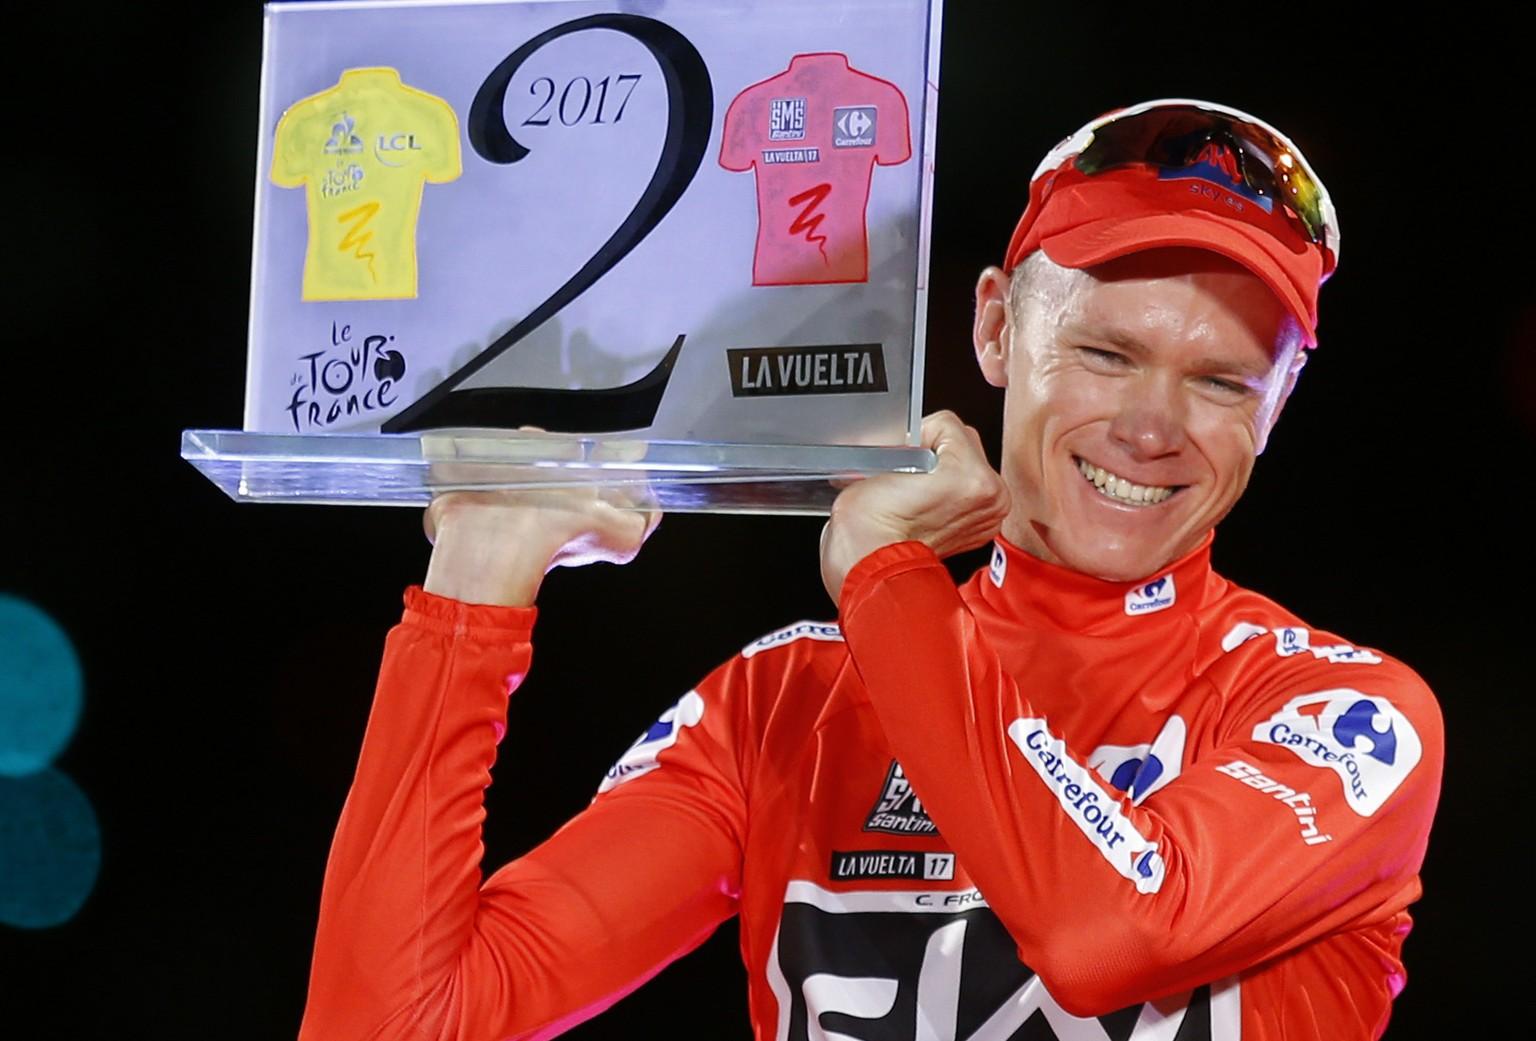 UCI: Auffälliger Test bei Tour-de-France-Sieger Froome